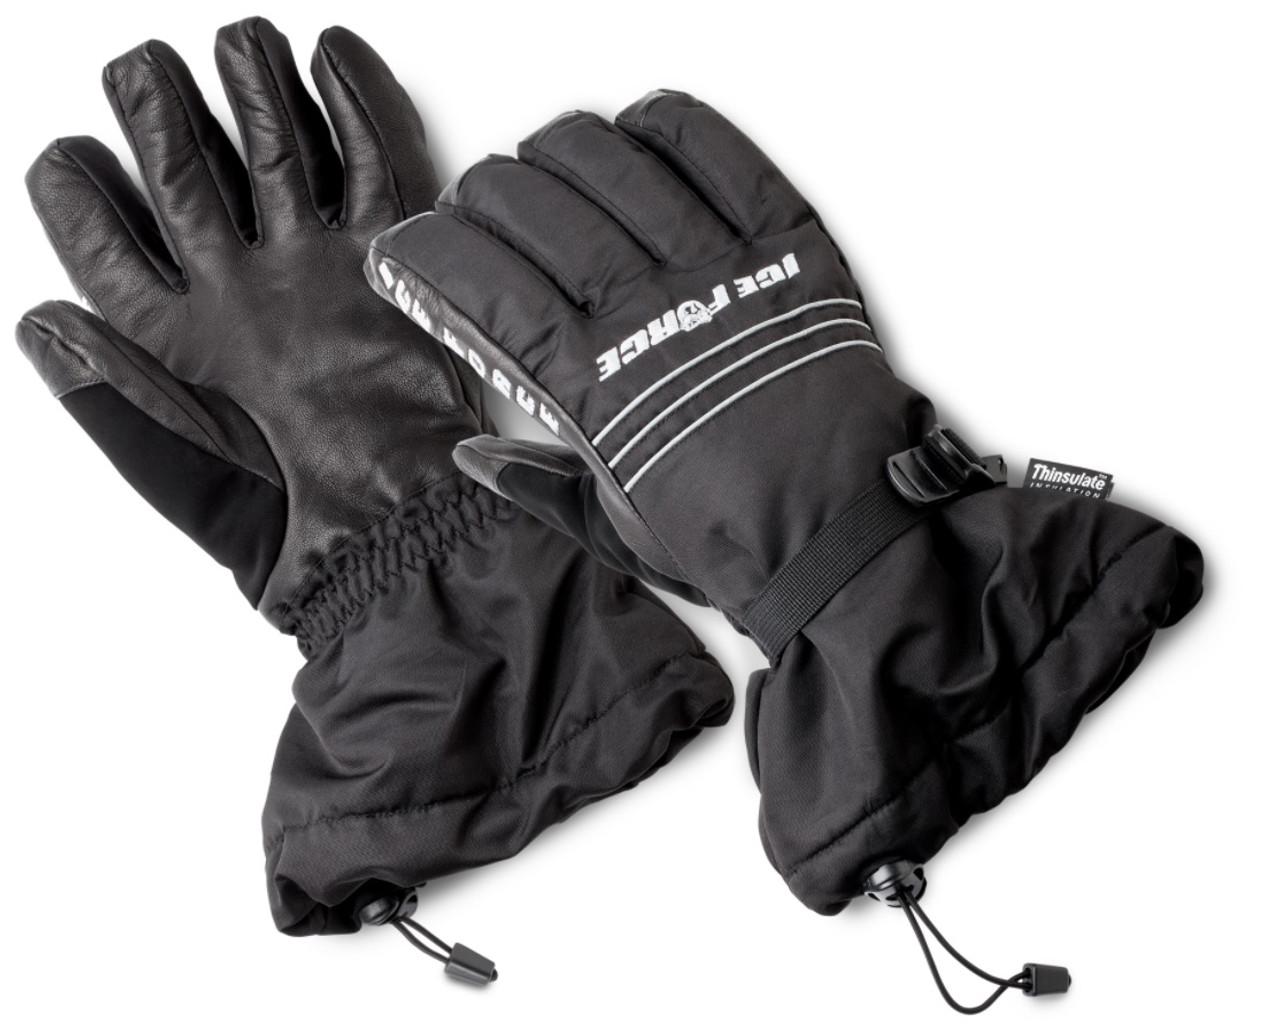 Strikemaster Heavyweight Ice Fishing Gloves SG03